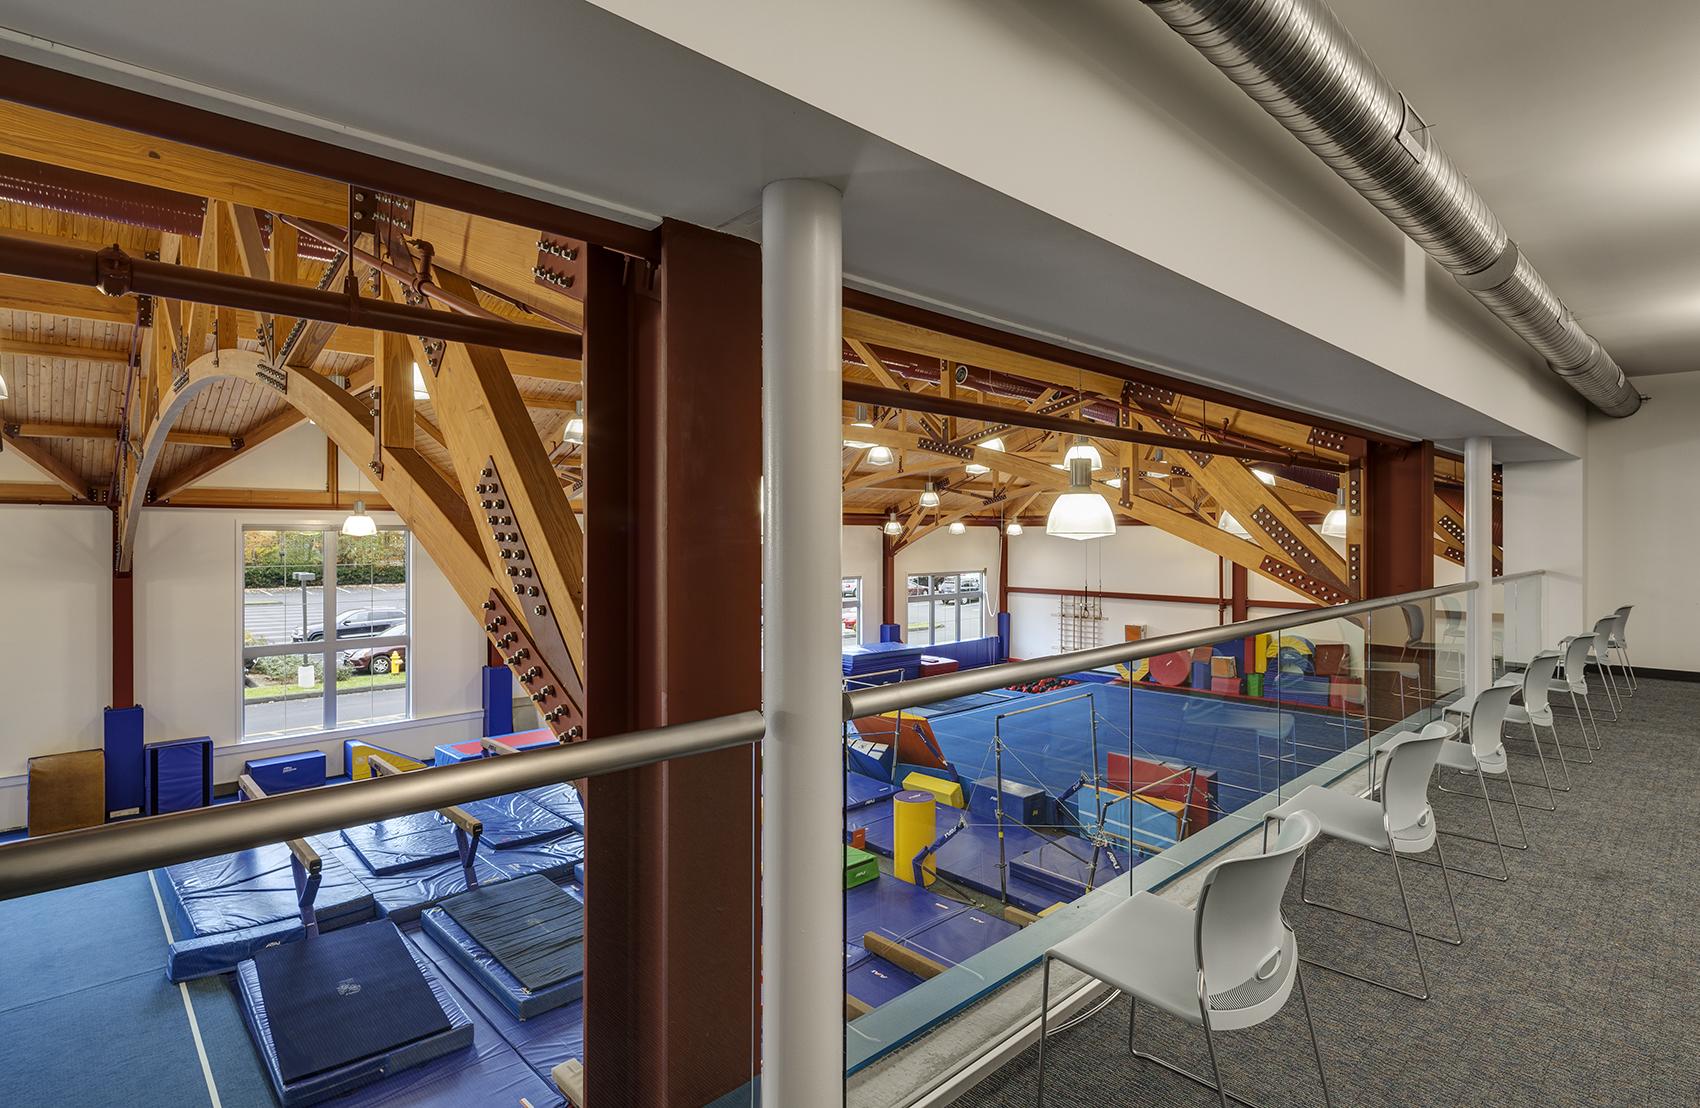 Darien YMCA gym overhead view